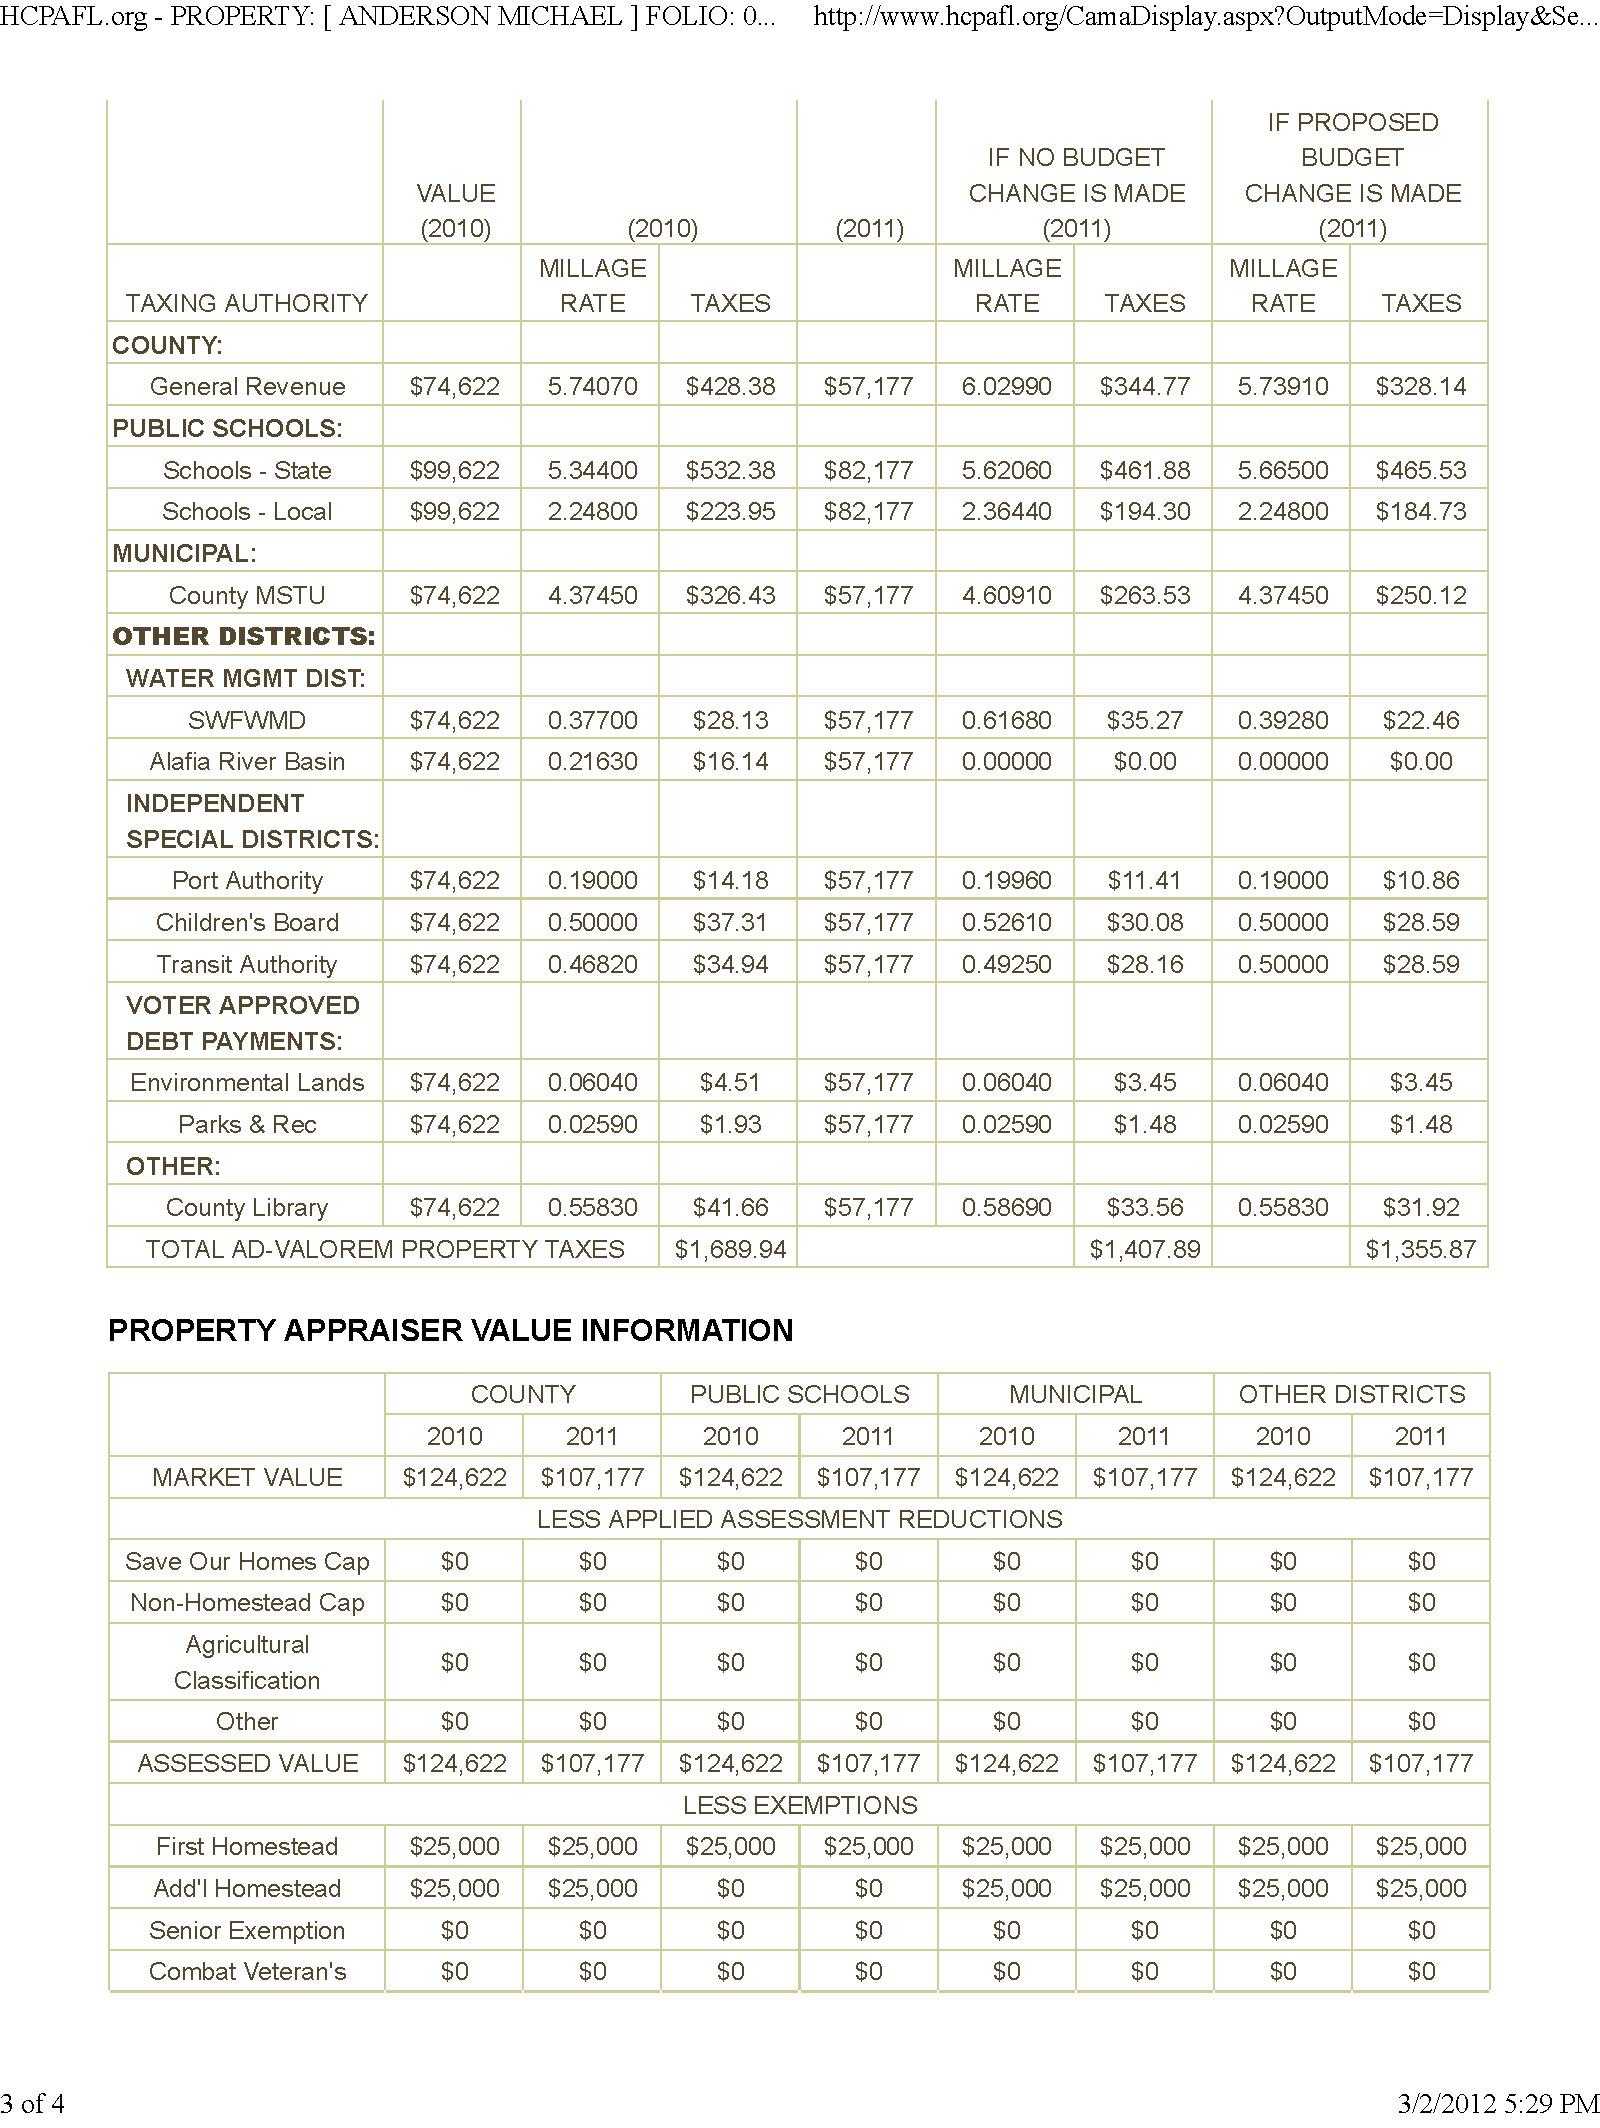 Copy of anderson ethel property tax info3.jpg